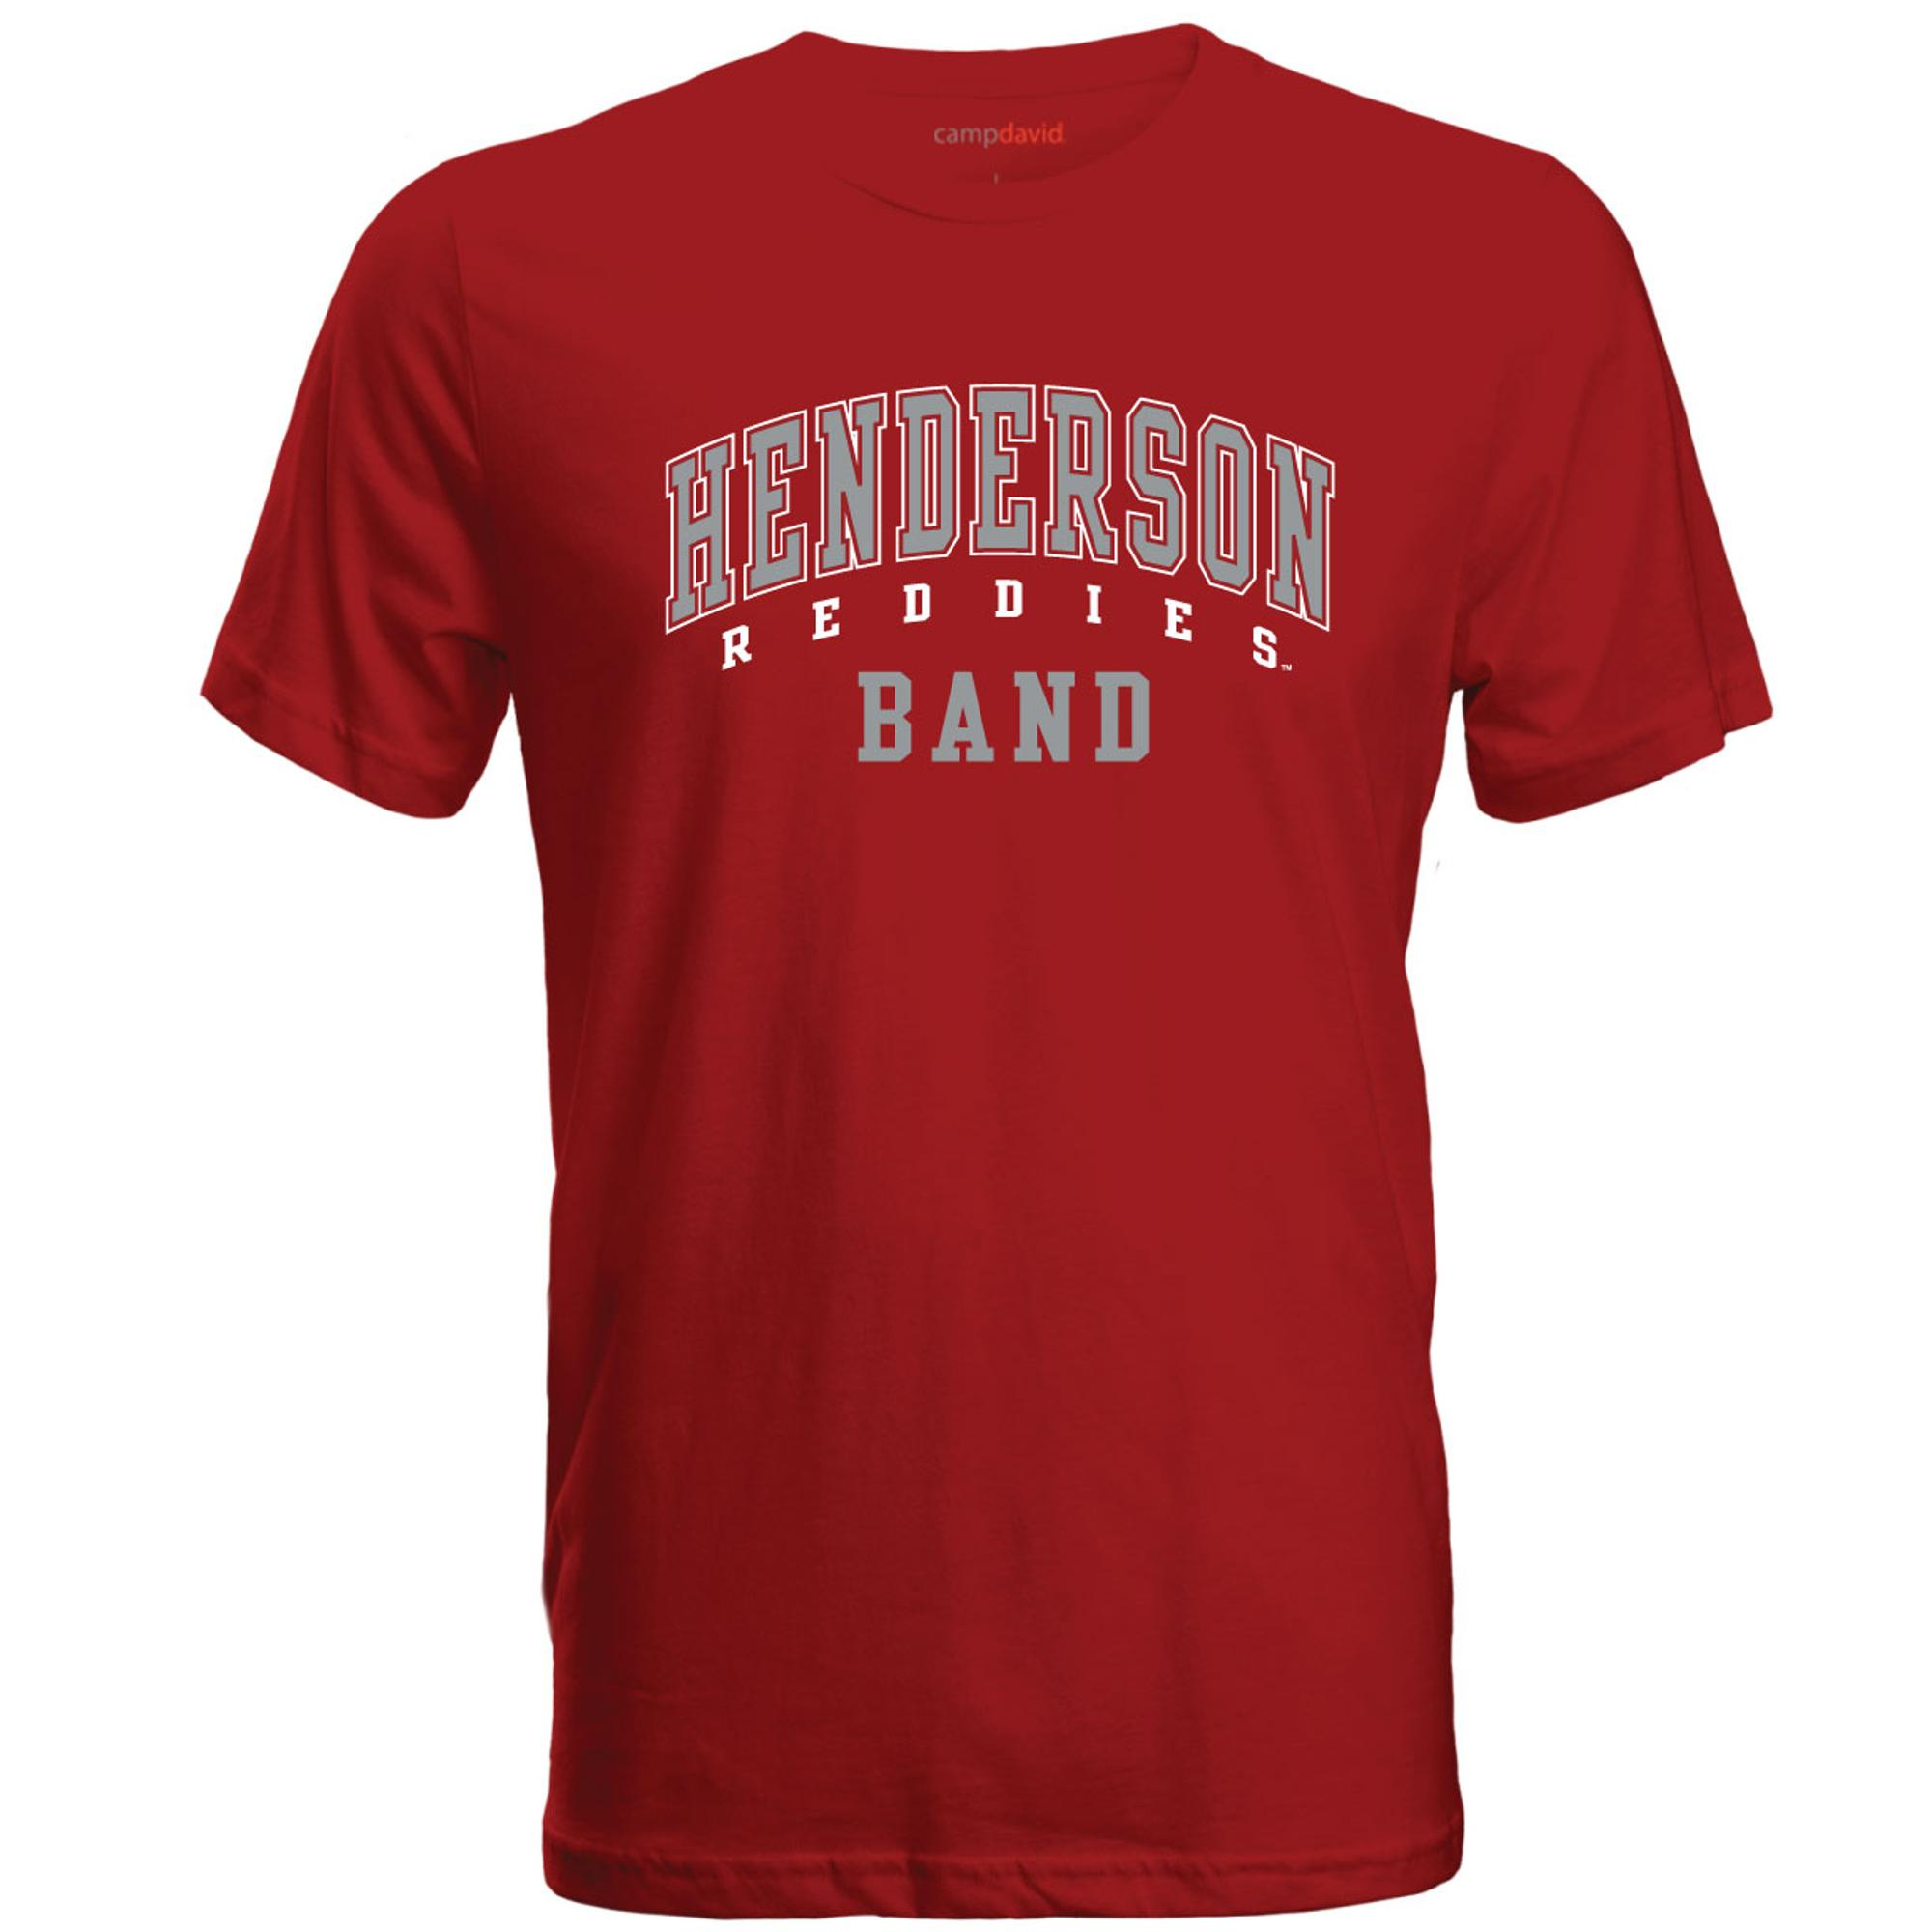 image of: Henderson Reddies Band Cruiser Tee